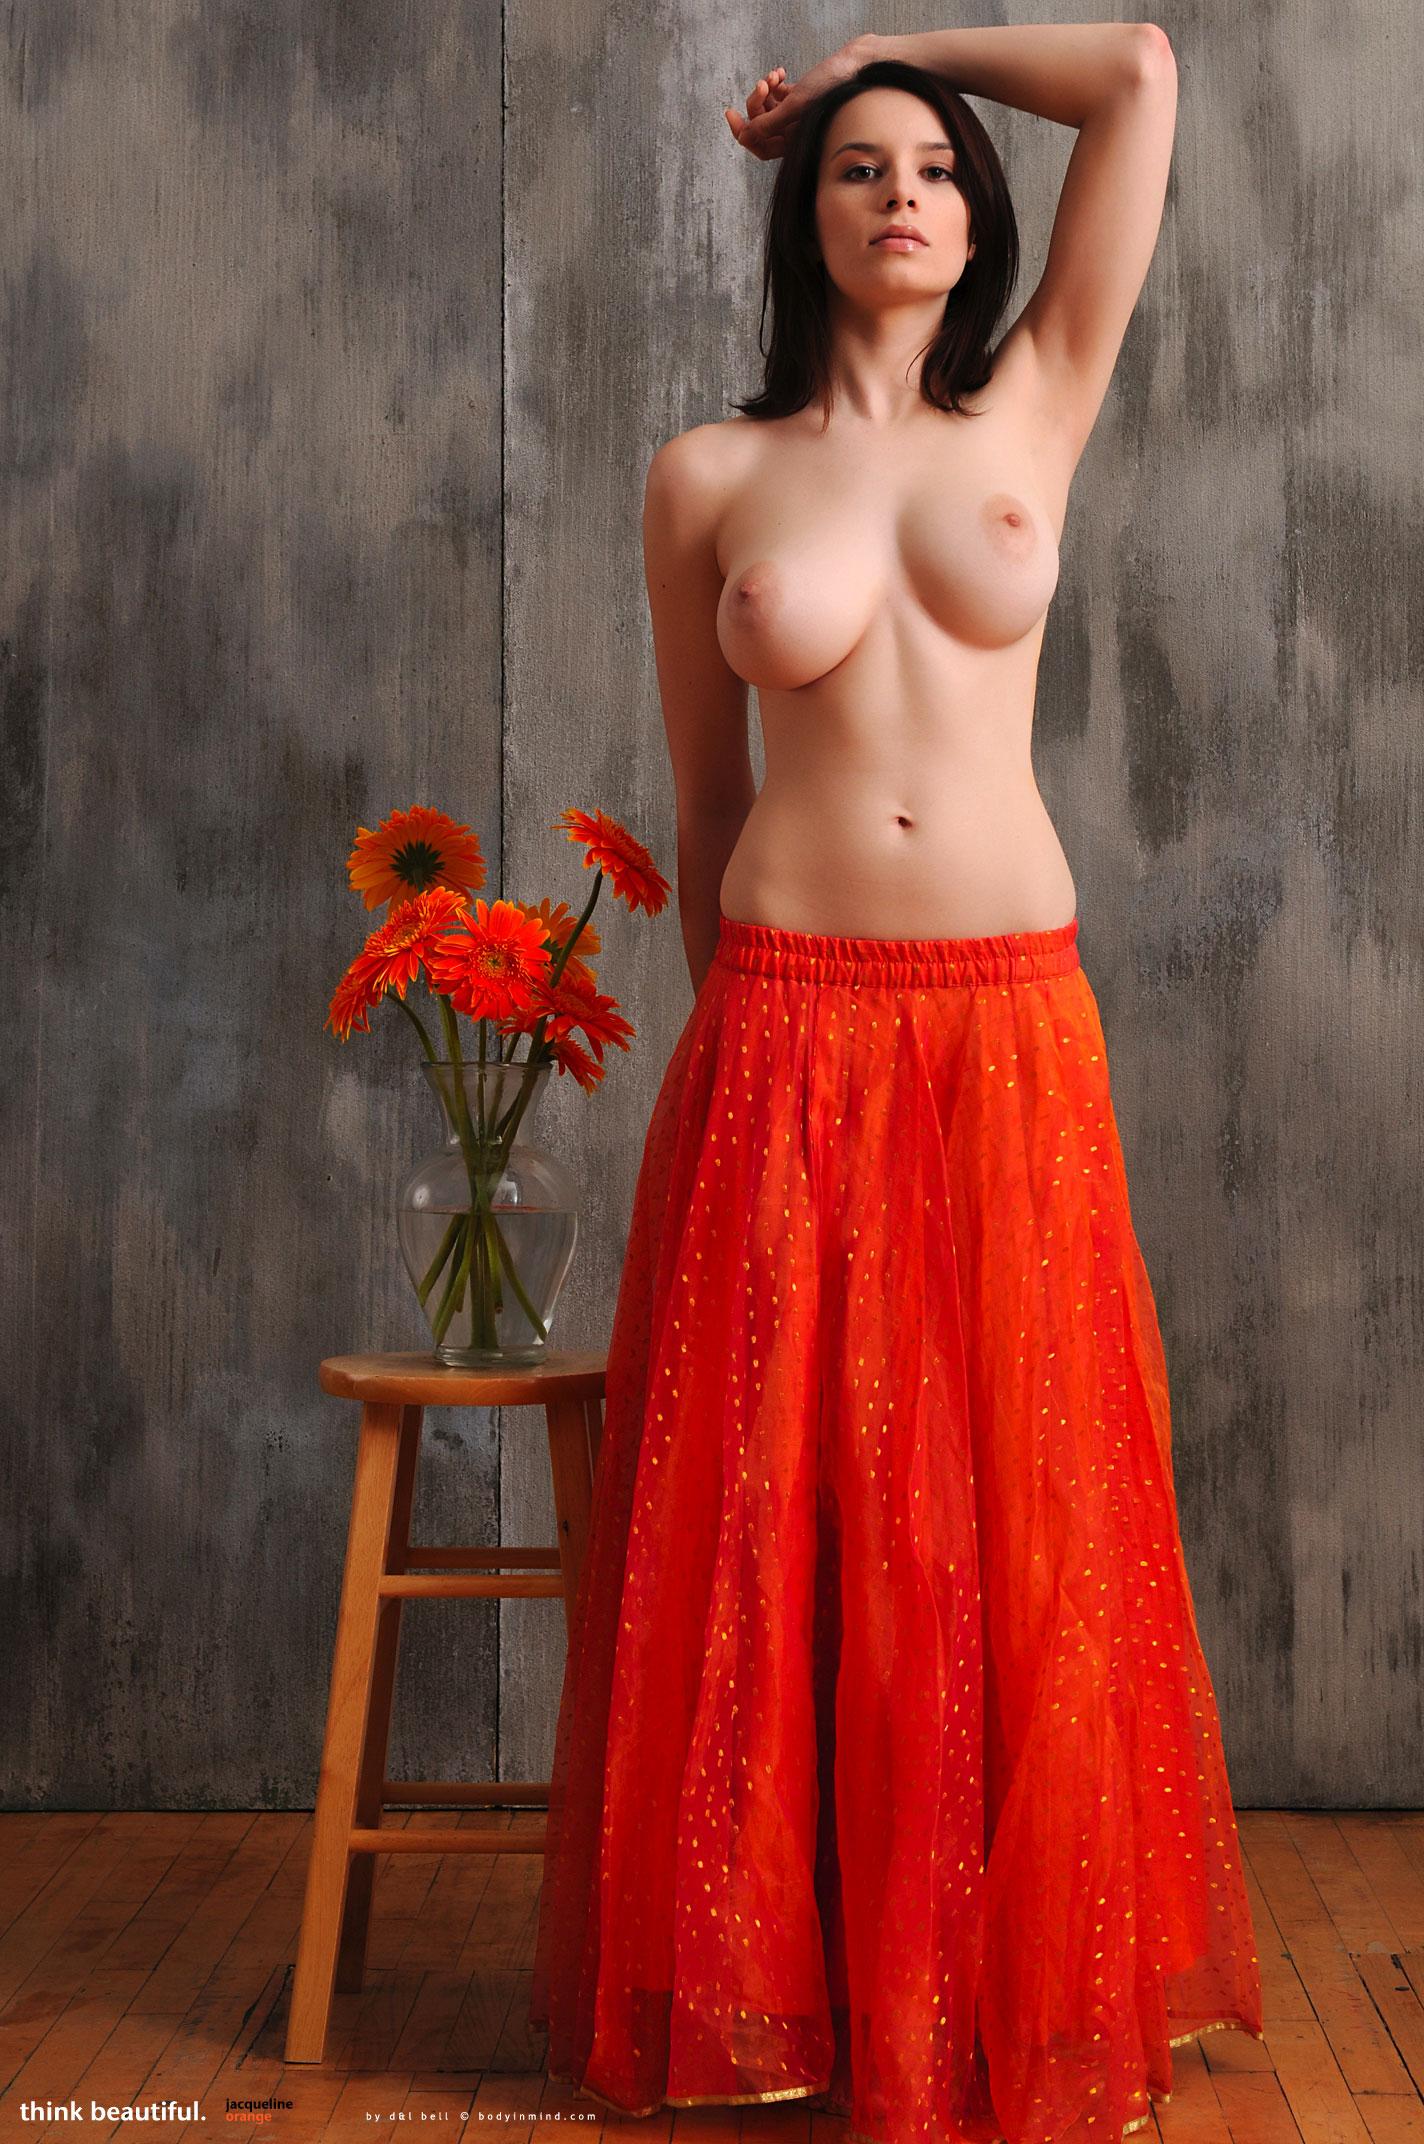 jacqueline in orange nudespuri com